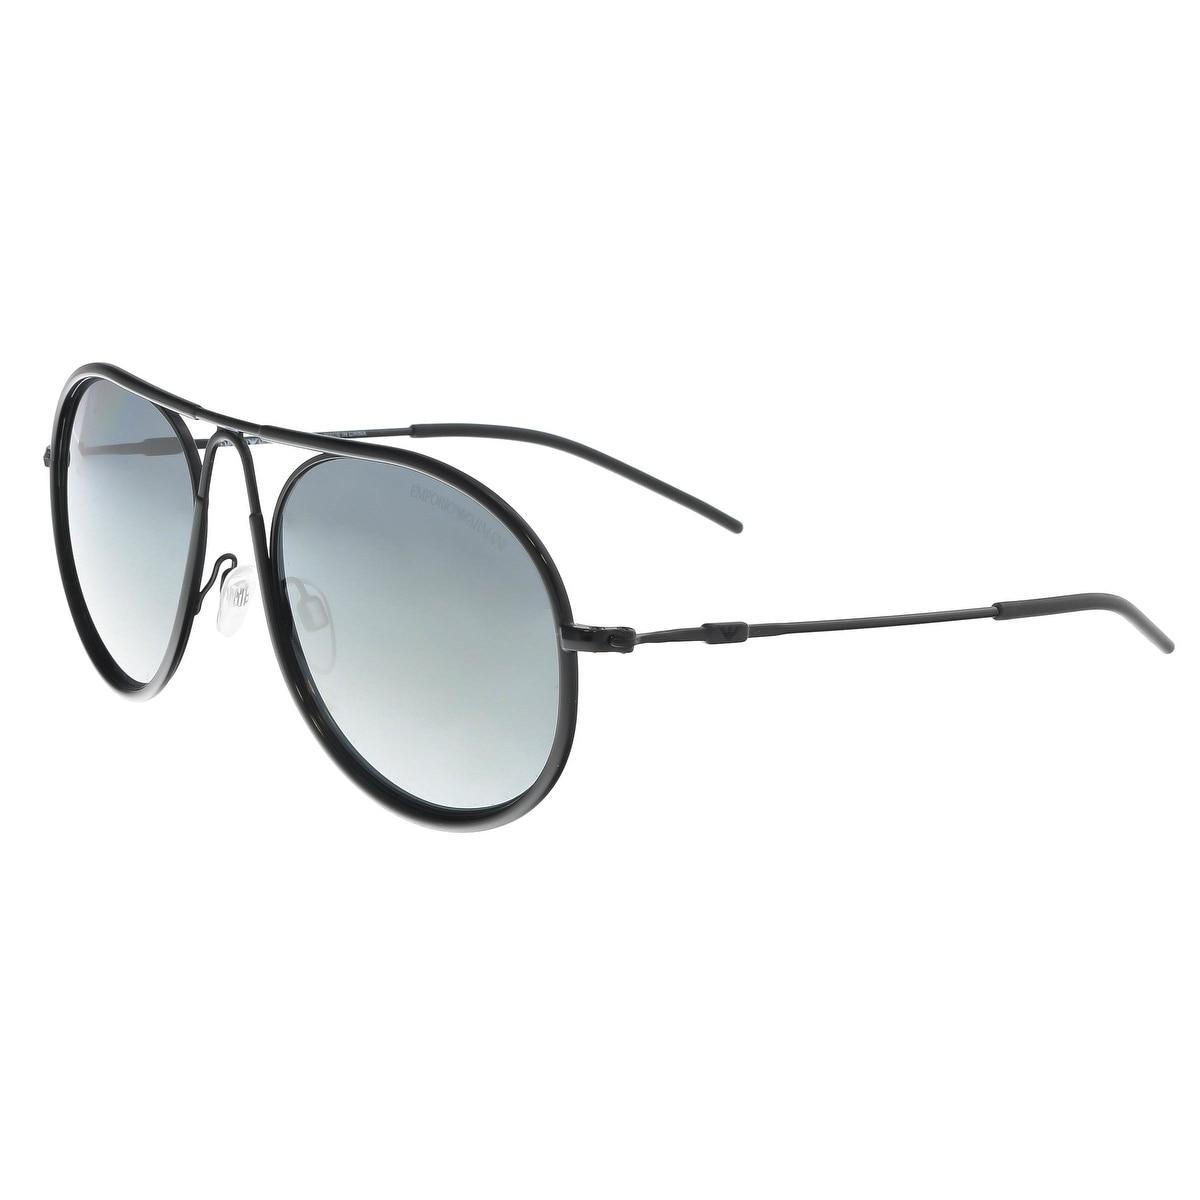 6d49a2ad6d Shop Emporio Armani EA2034 30146G Black Aviator Sunglasses - 54-19-140 -  Free Shipping Today - Overstock - 22355634